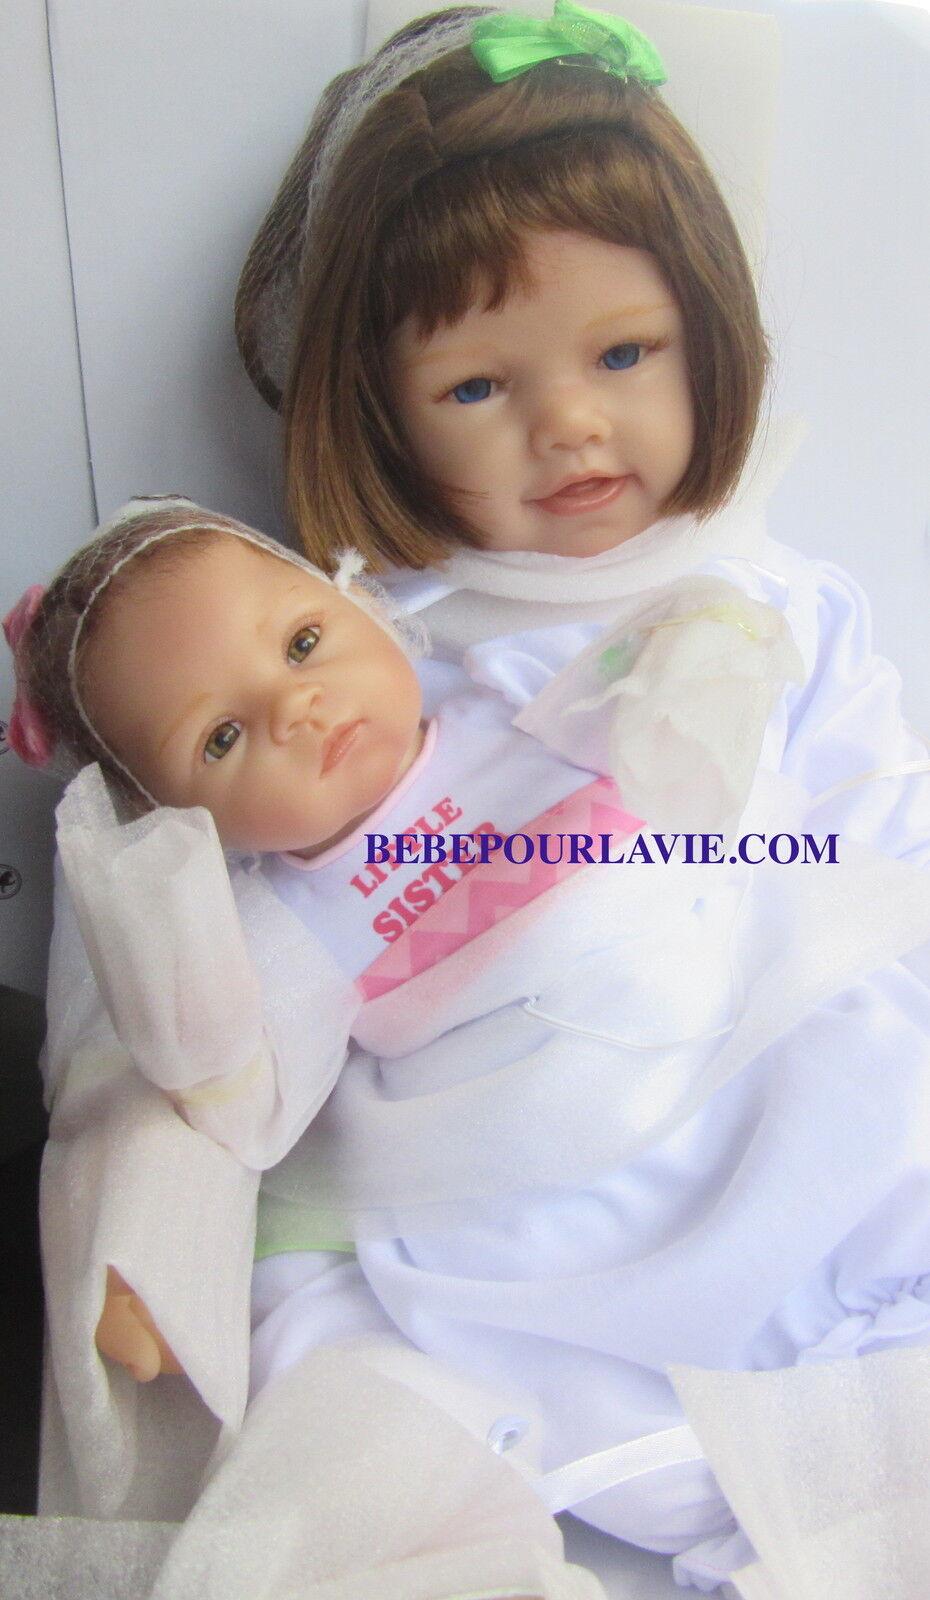 Ashton drake a sister 39 s love poseable baby doll set by for The ashton